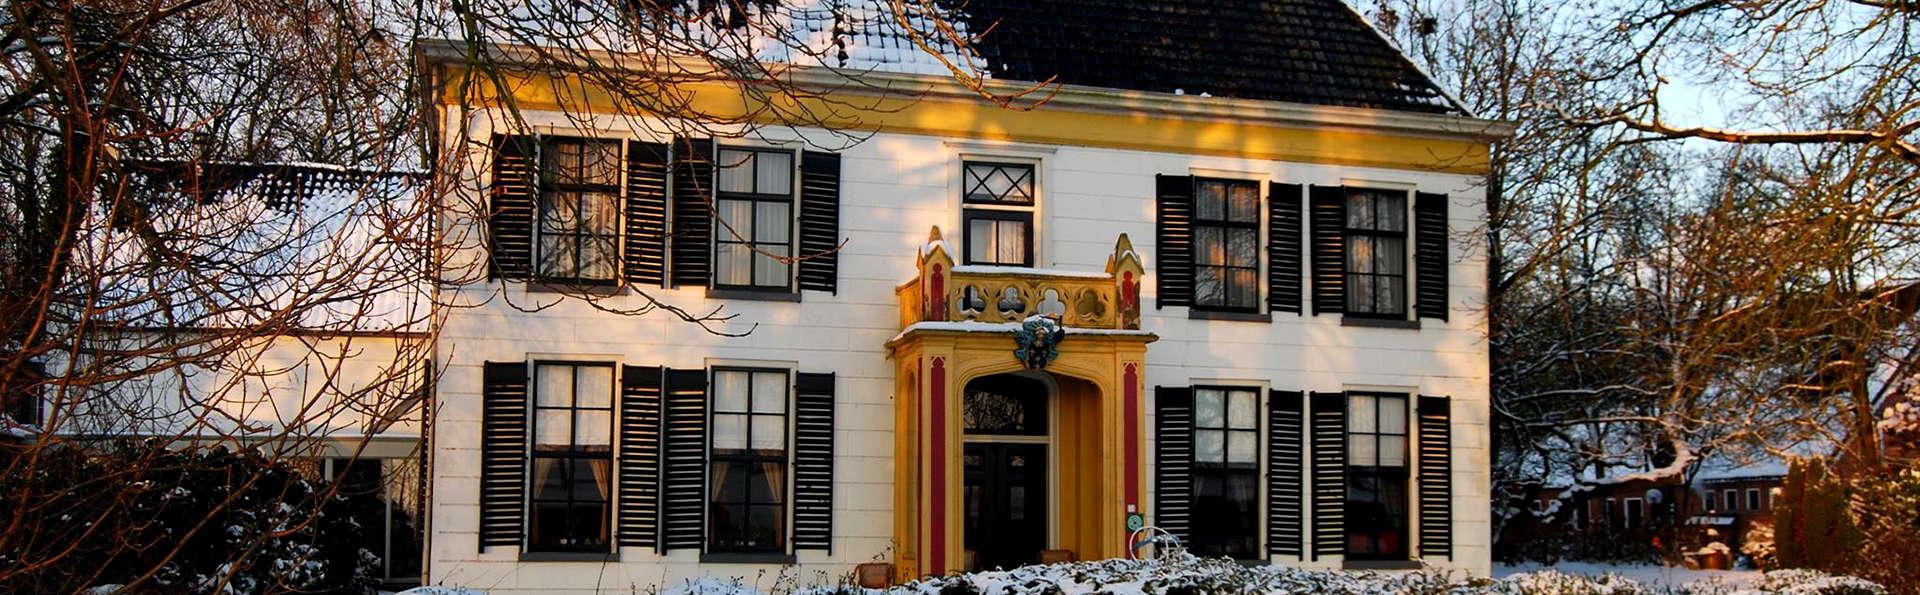 Hotel Landgoed Ekenstein - Edit_Front.jpg